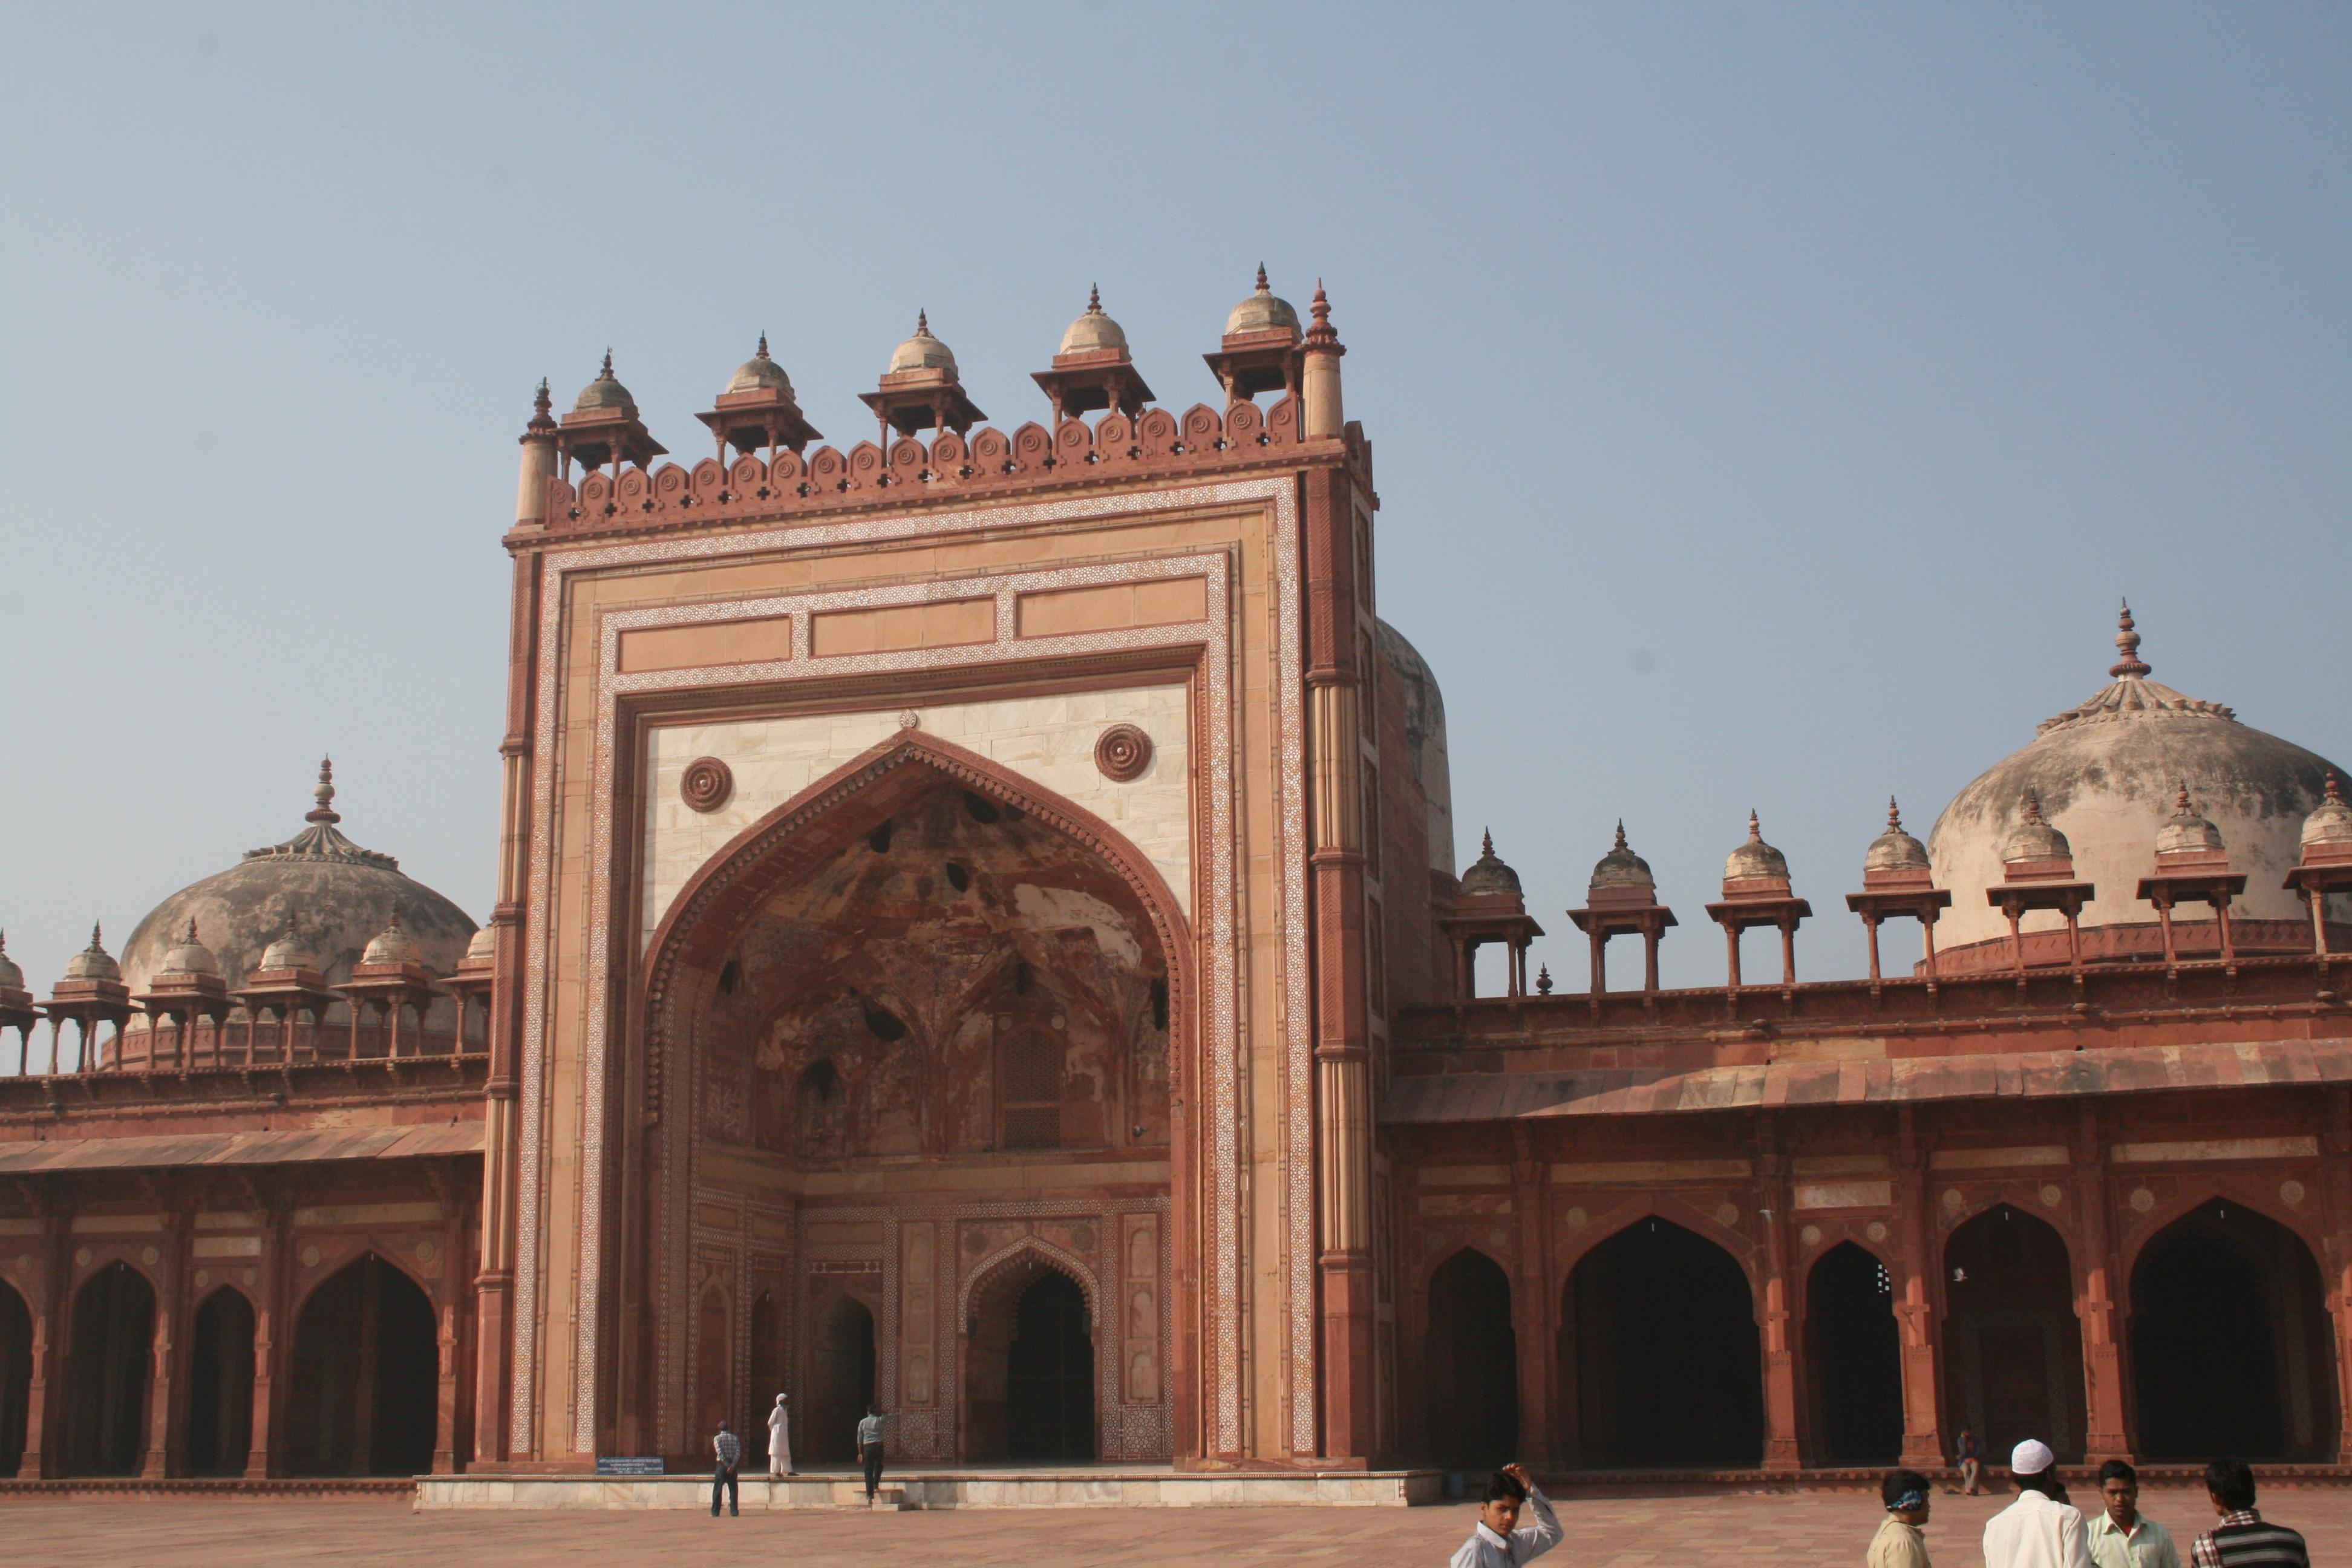 Fatehpur Sikri India  city photos : Jama Masjid Sikri Fatehpur Sikri India0008 Wikipedia, the ...